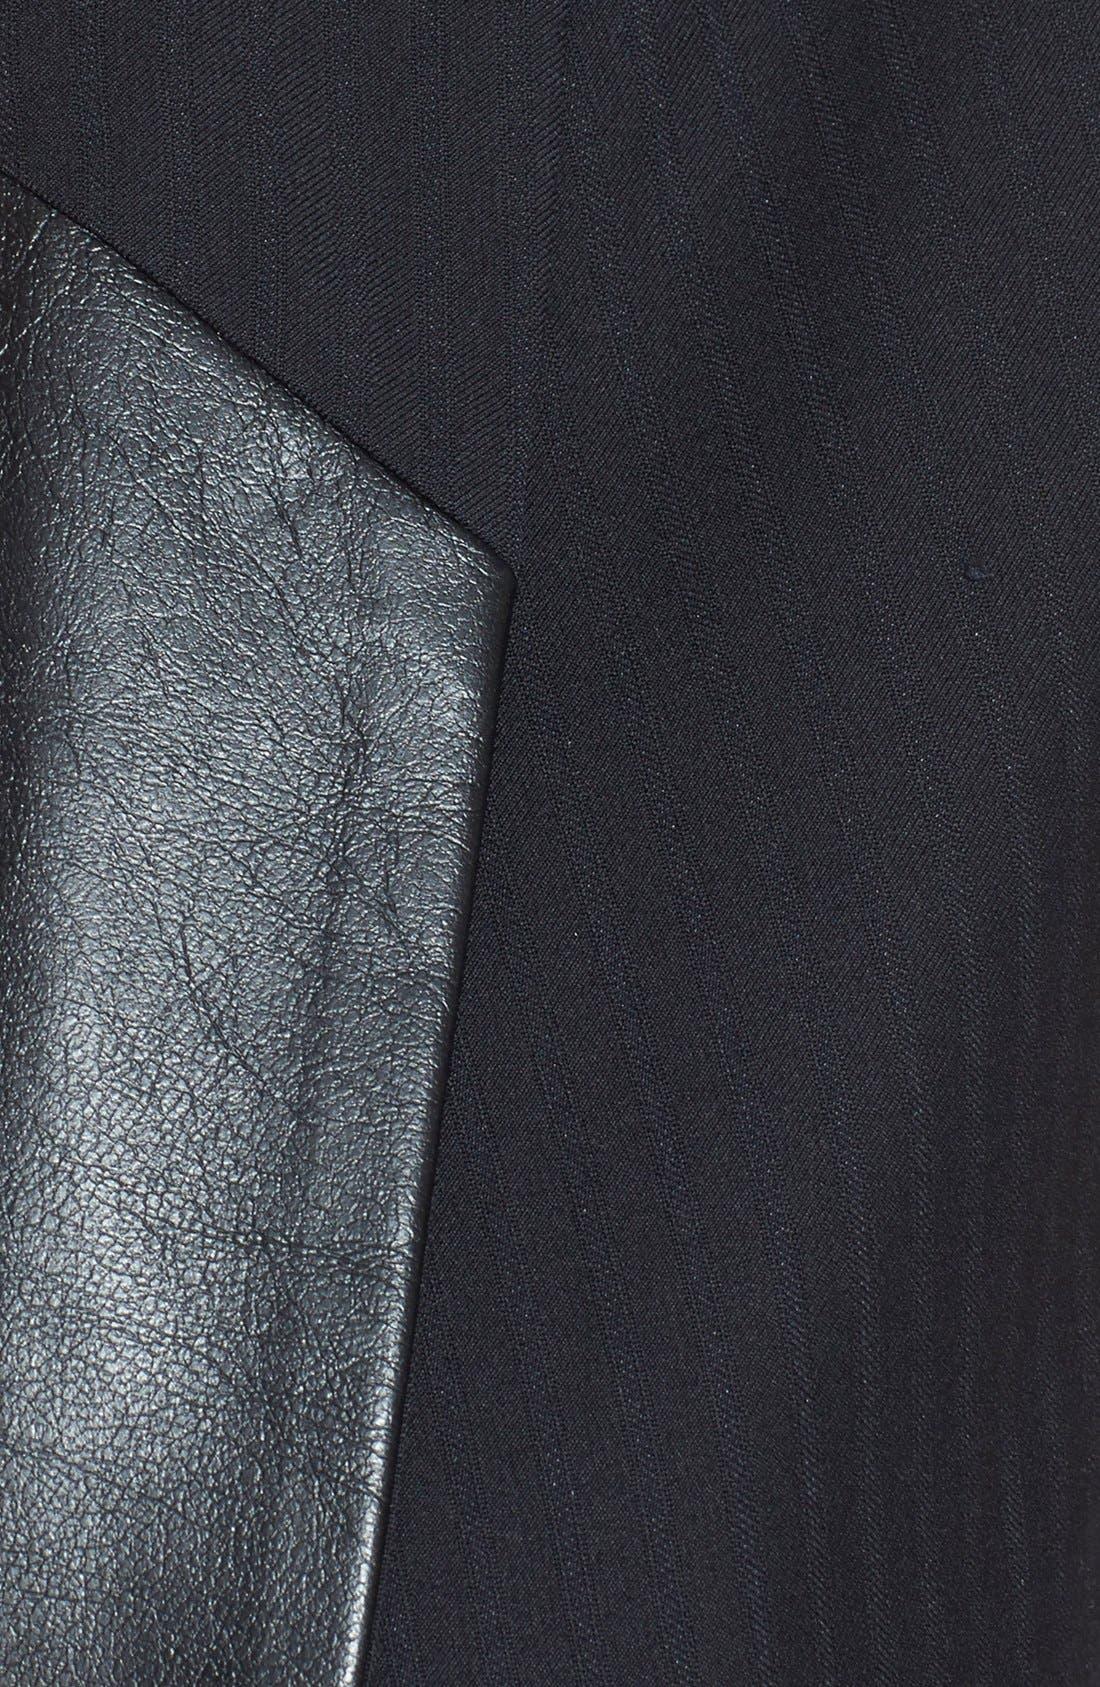 Faux Leather Trim Sleeveless Blazer,                             Alternate thumbnail 3, color,                             Black